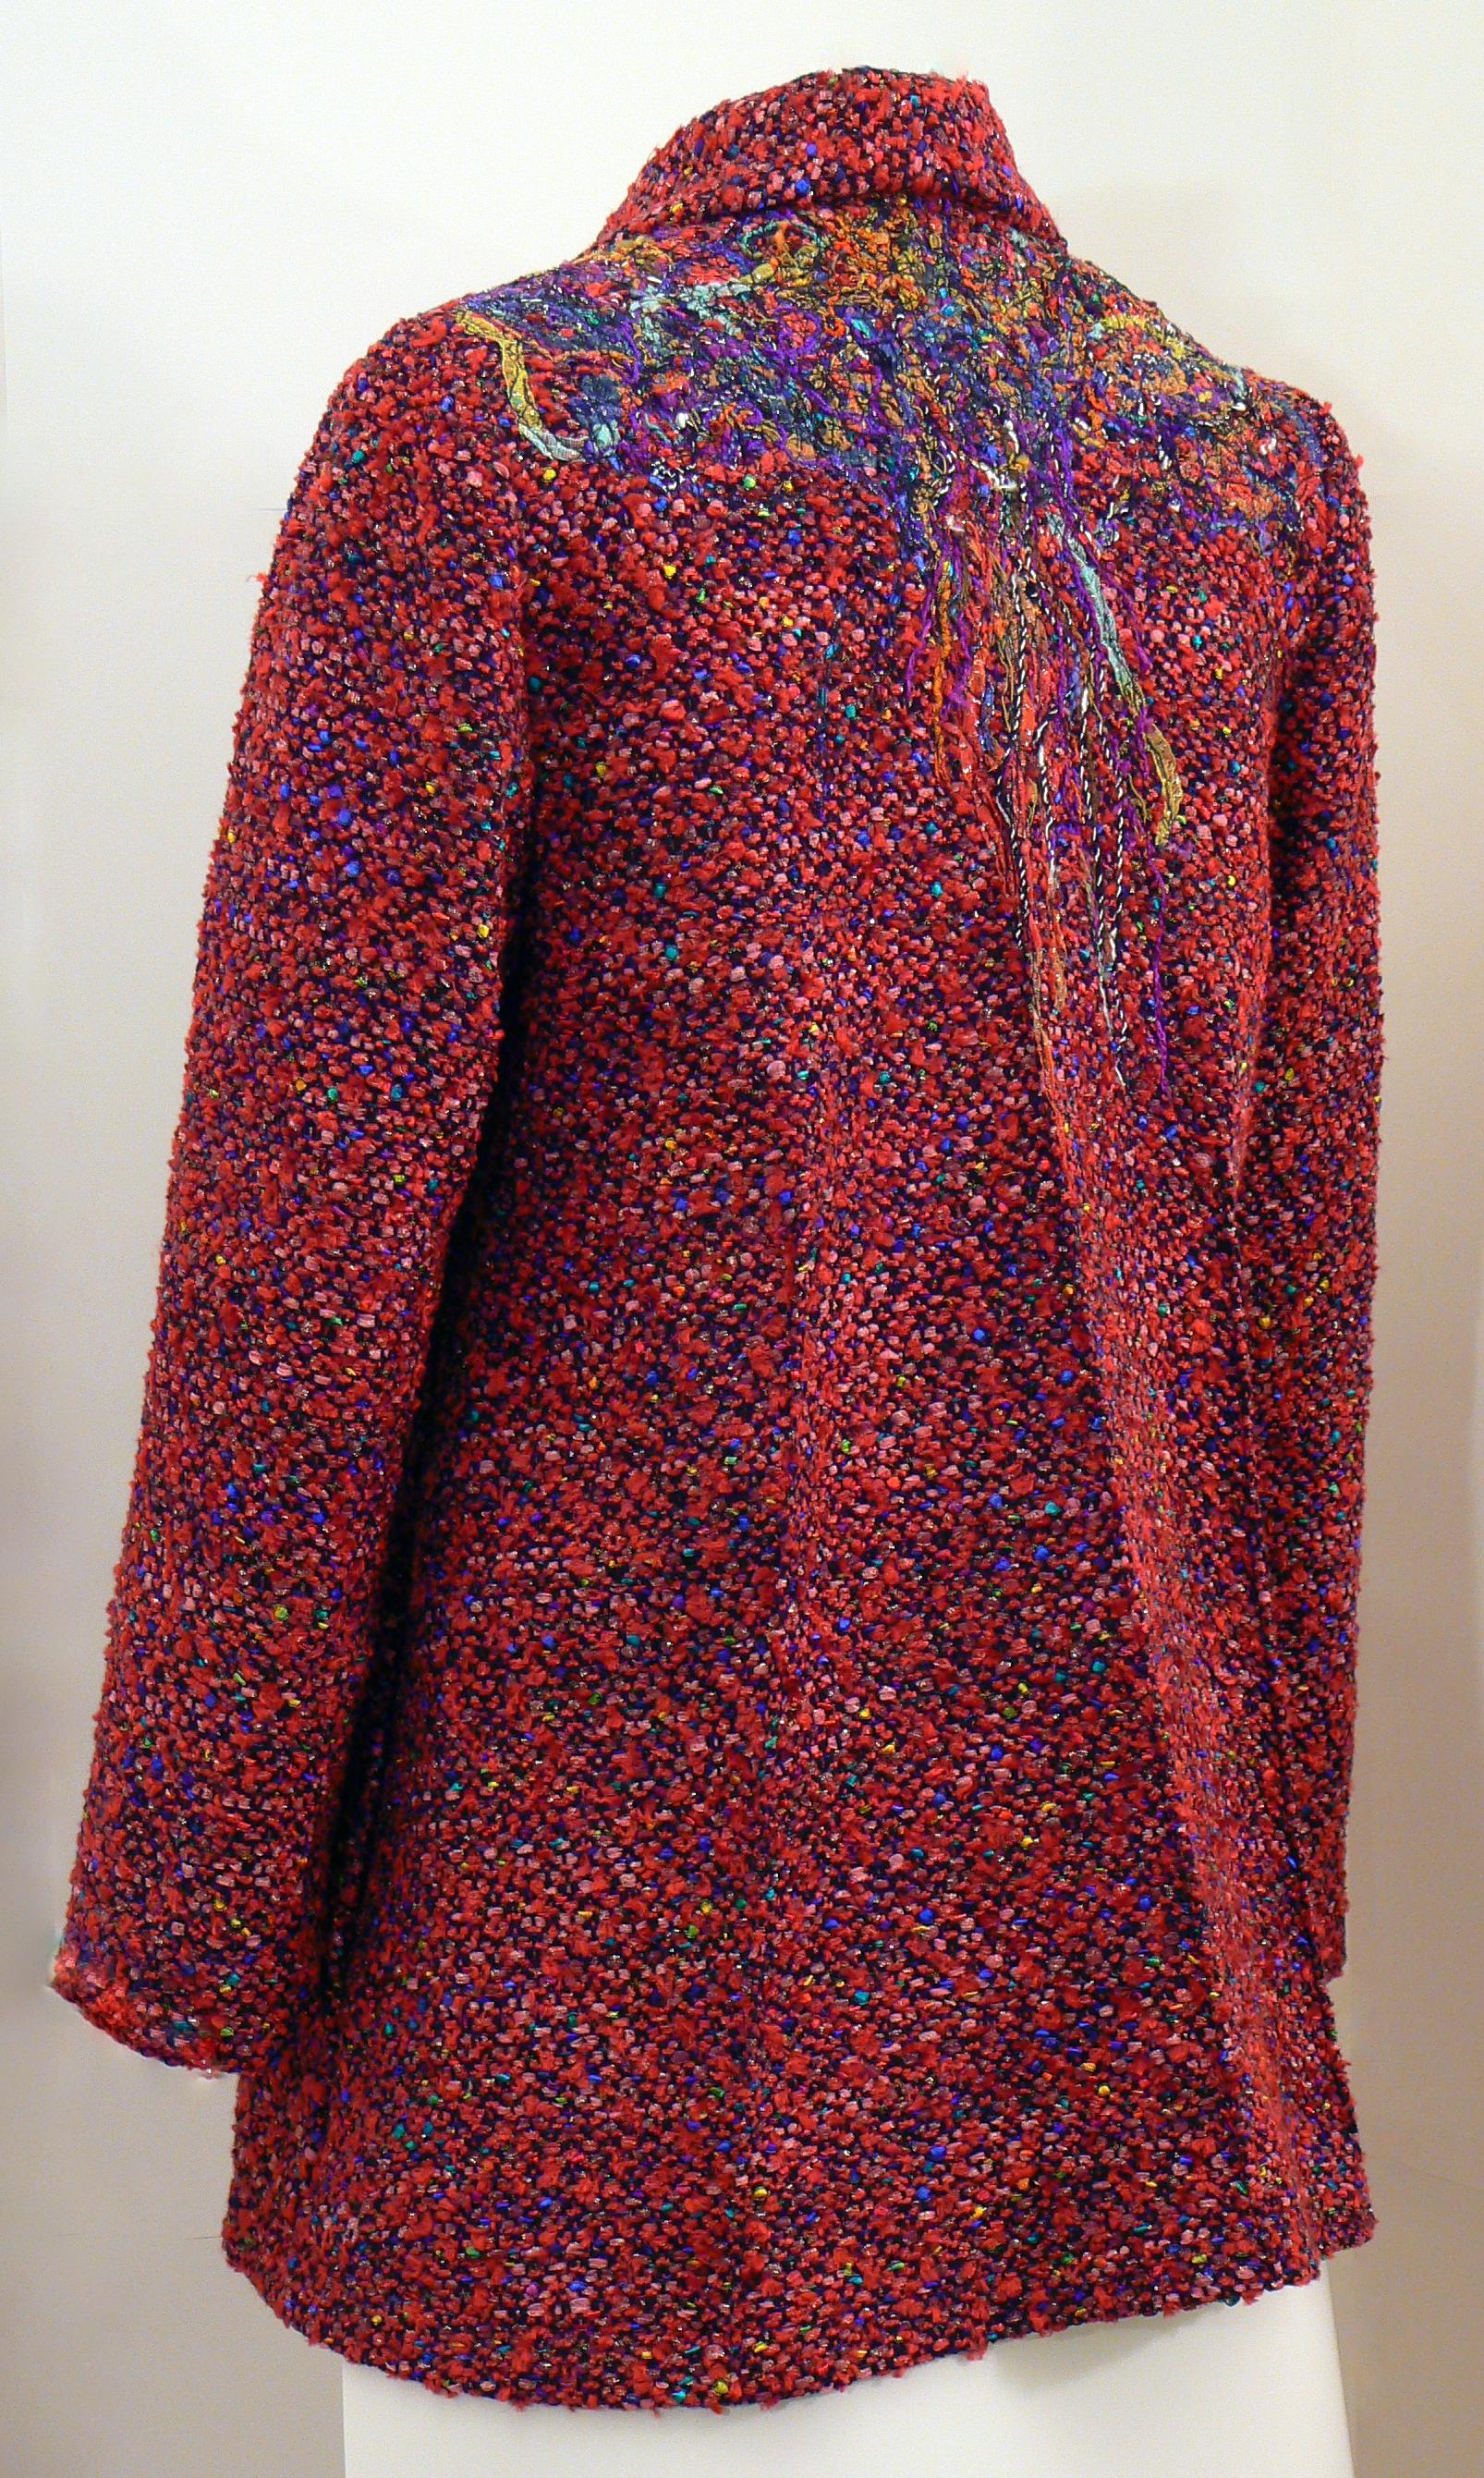 Handwoven Clothing, Wearable Art, Kathleen Weir-West, 23-001.JPG